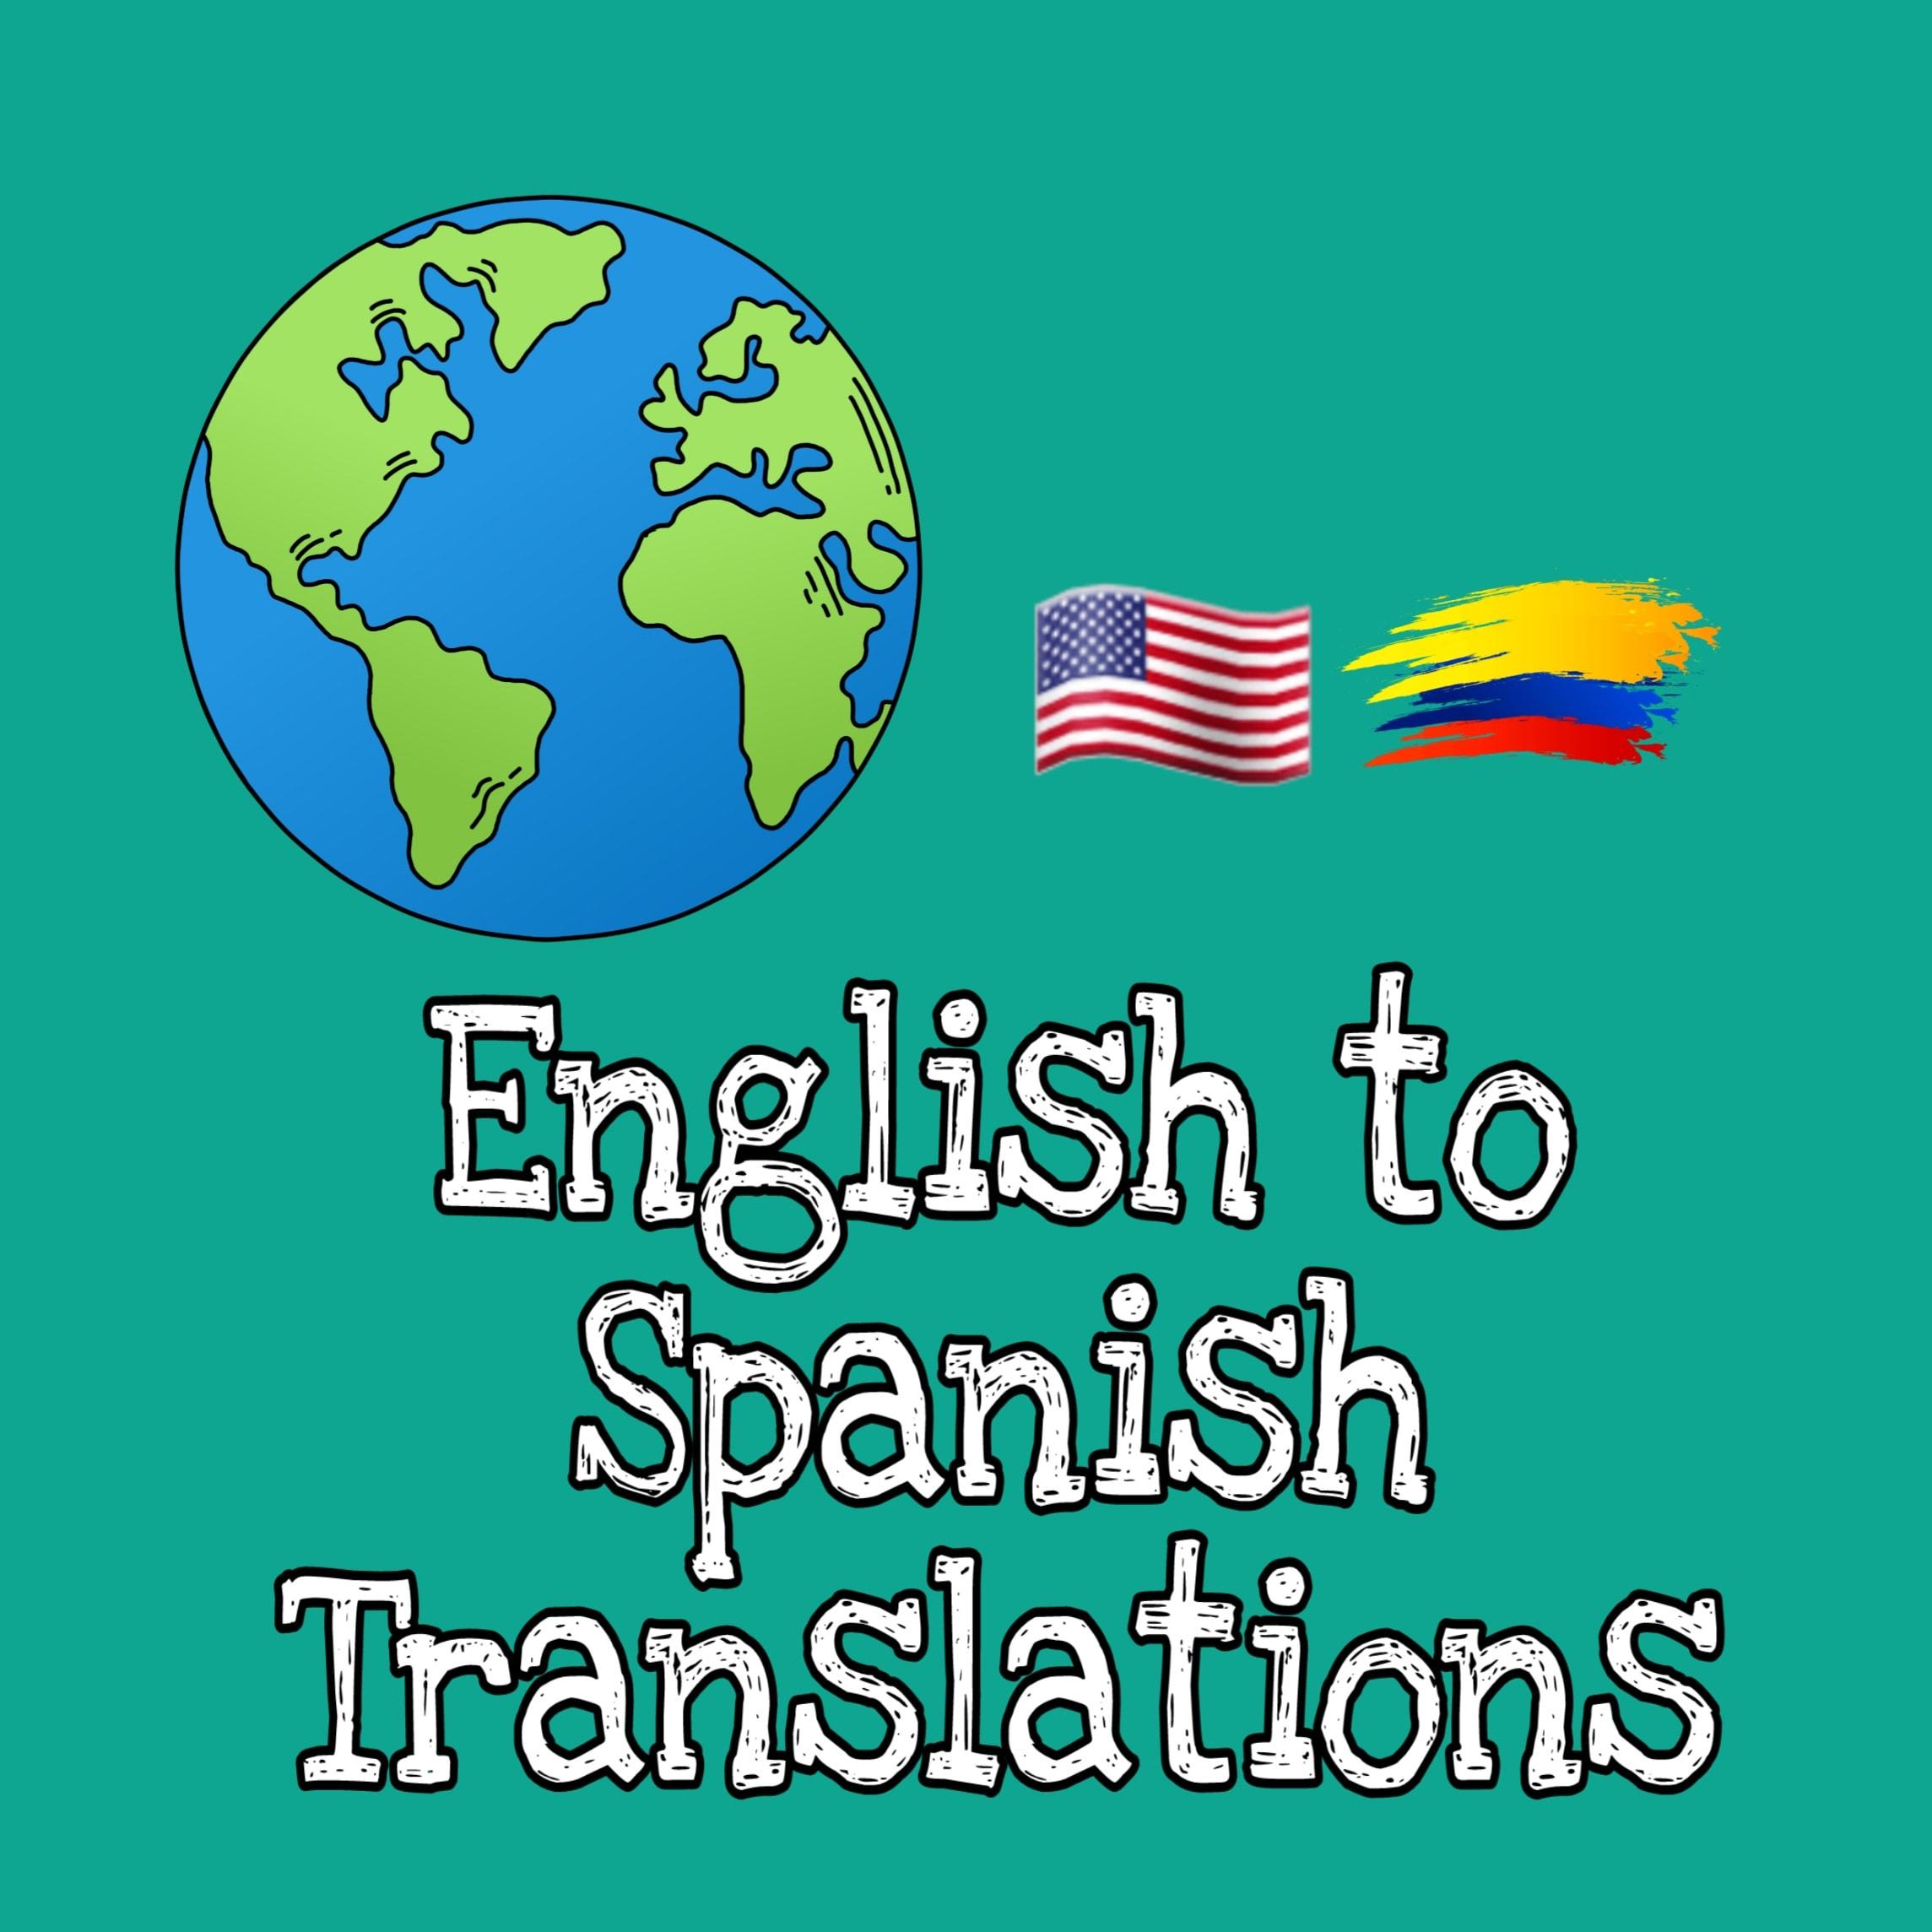 Translate english to spanish by Johanaar